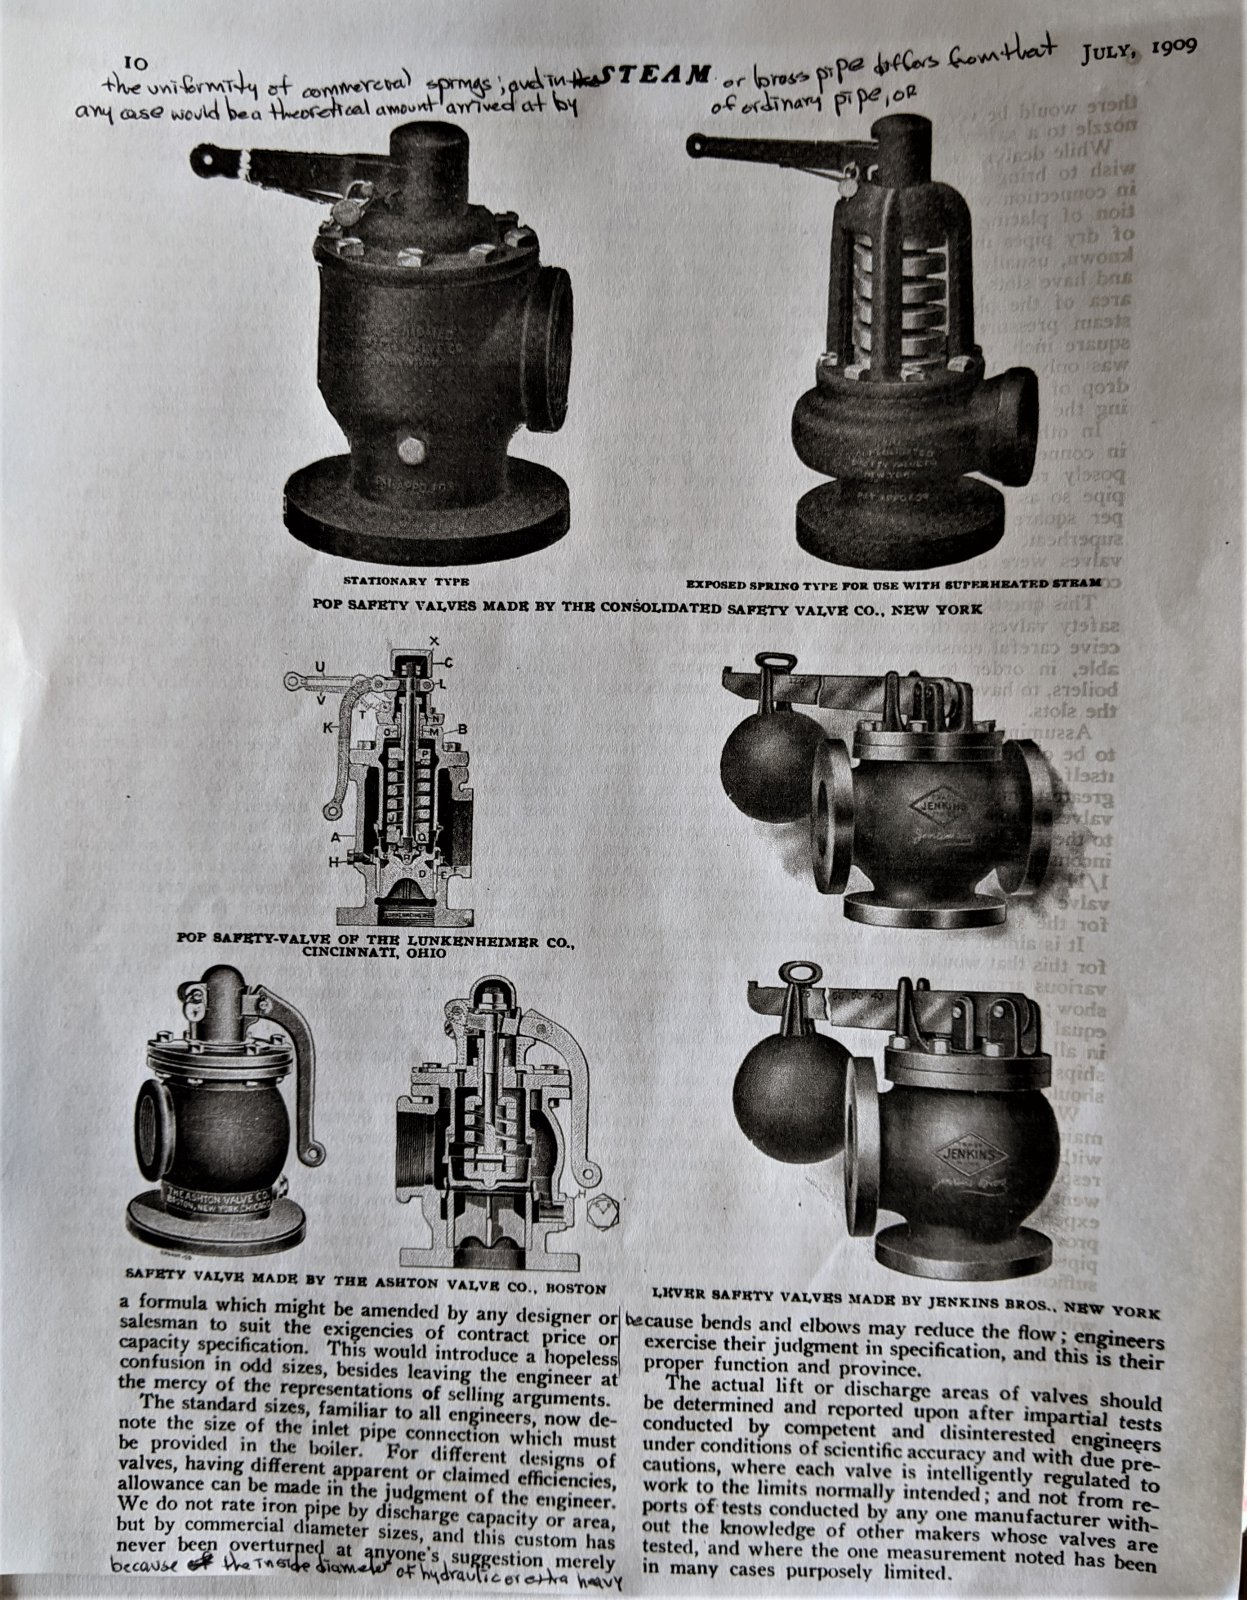 1909 Safety Valve Data    6.jpg